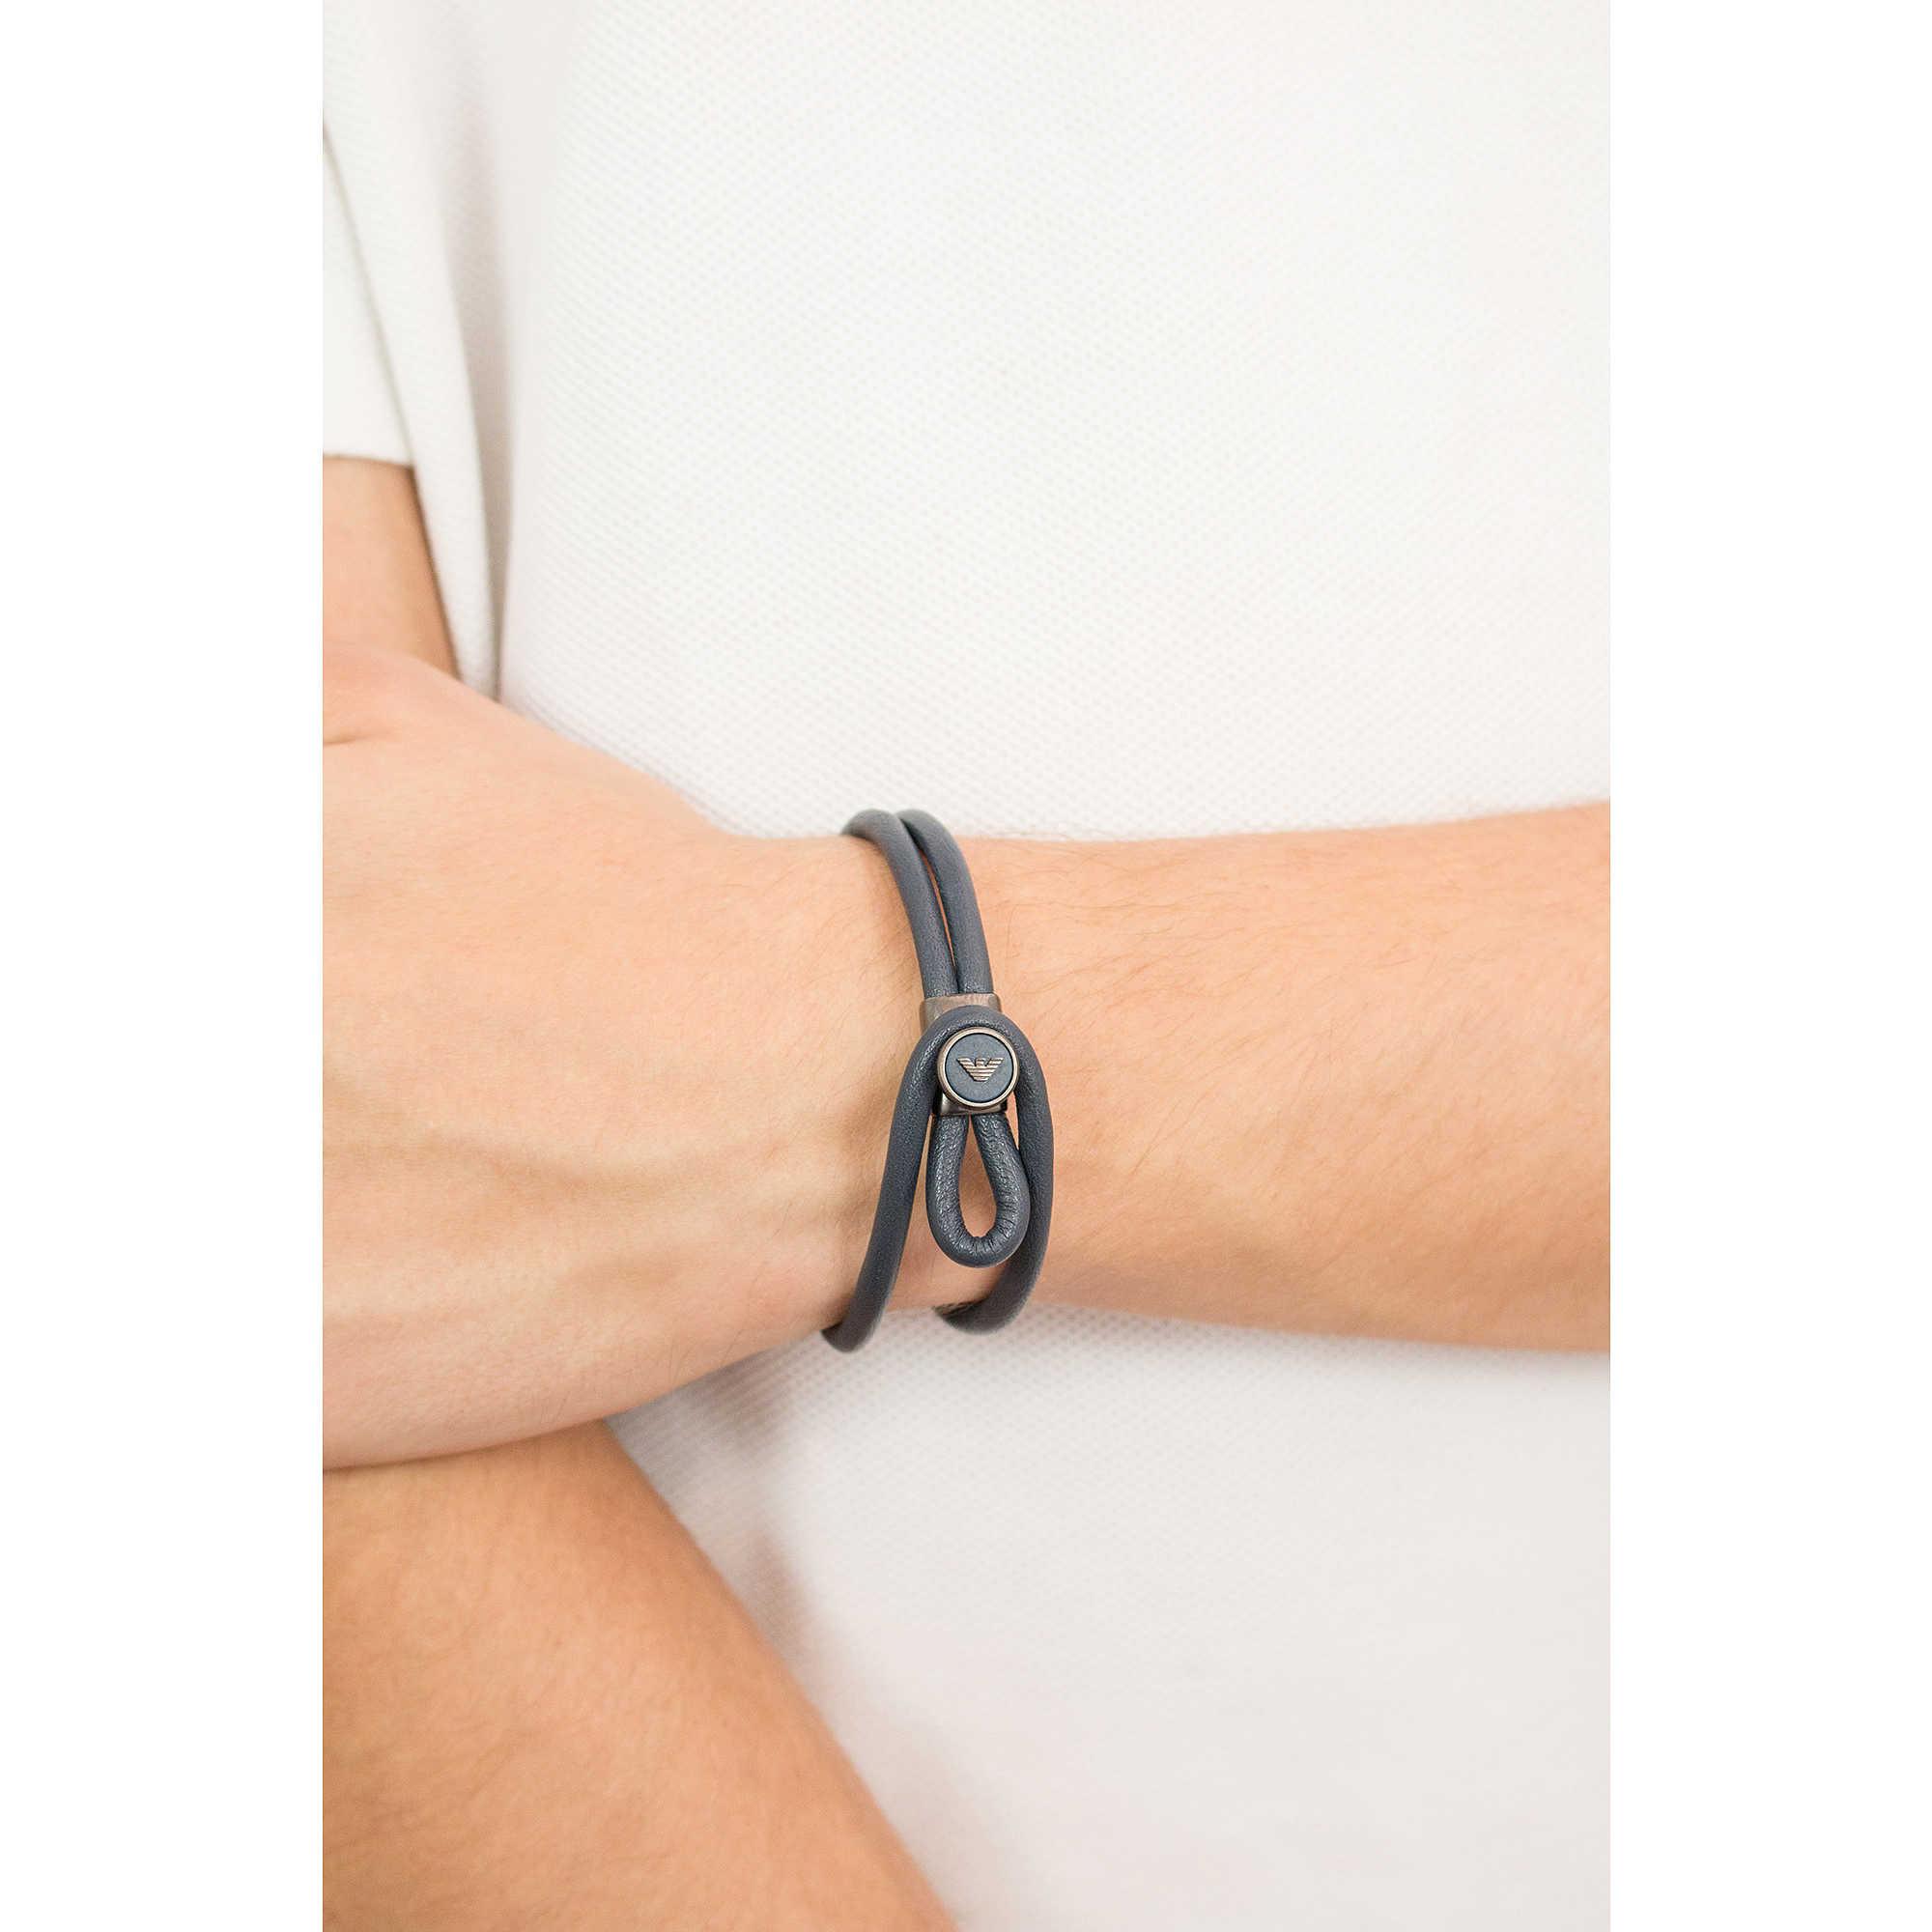 zoom. package bracelets Emporio Armani EGS2214020. zoom. bracelet man  jewellery Emporio Armani EGS2214020 1a35859983c